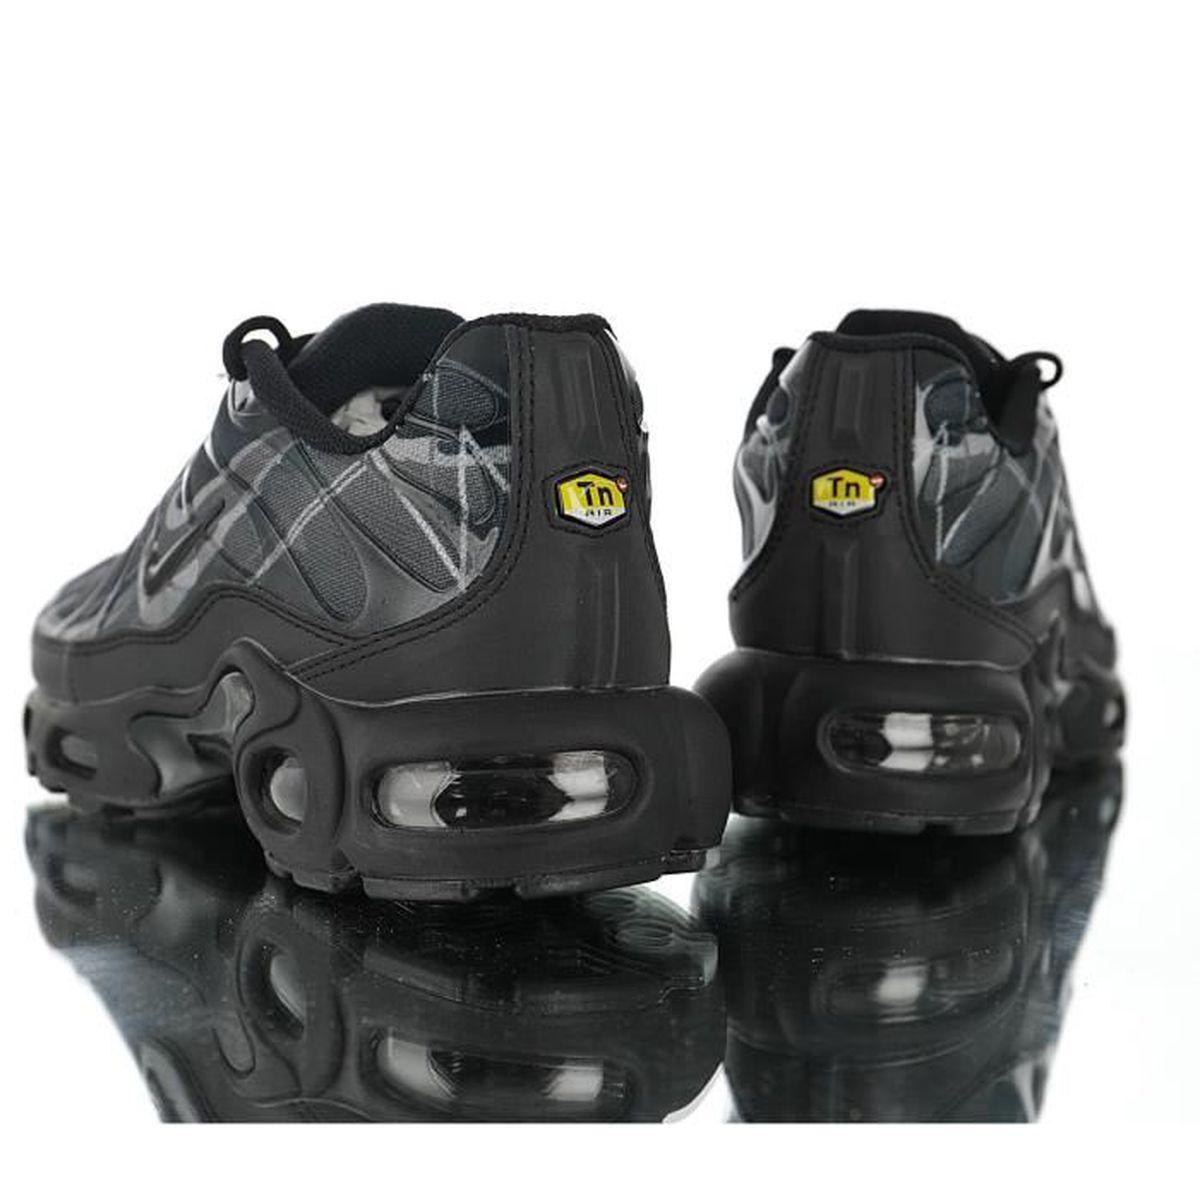 baskets nike air max tn plus txt chaussures de running homme noir